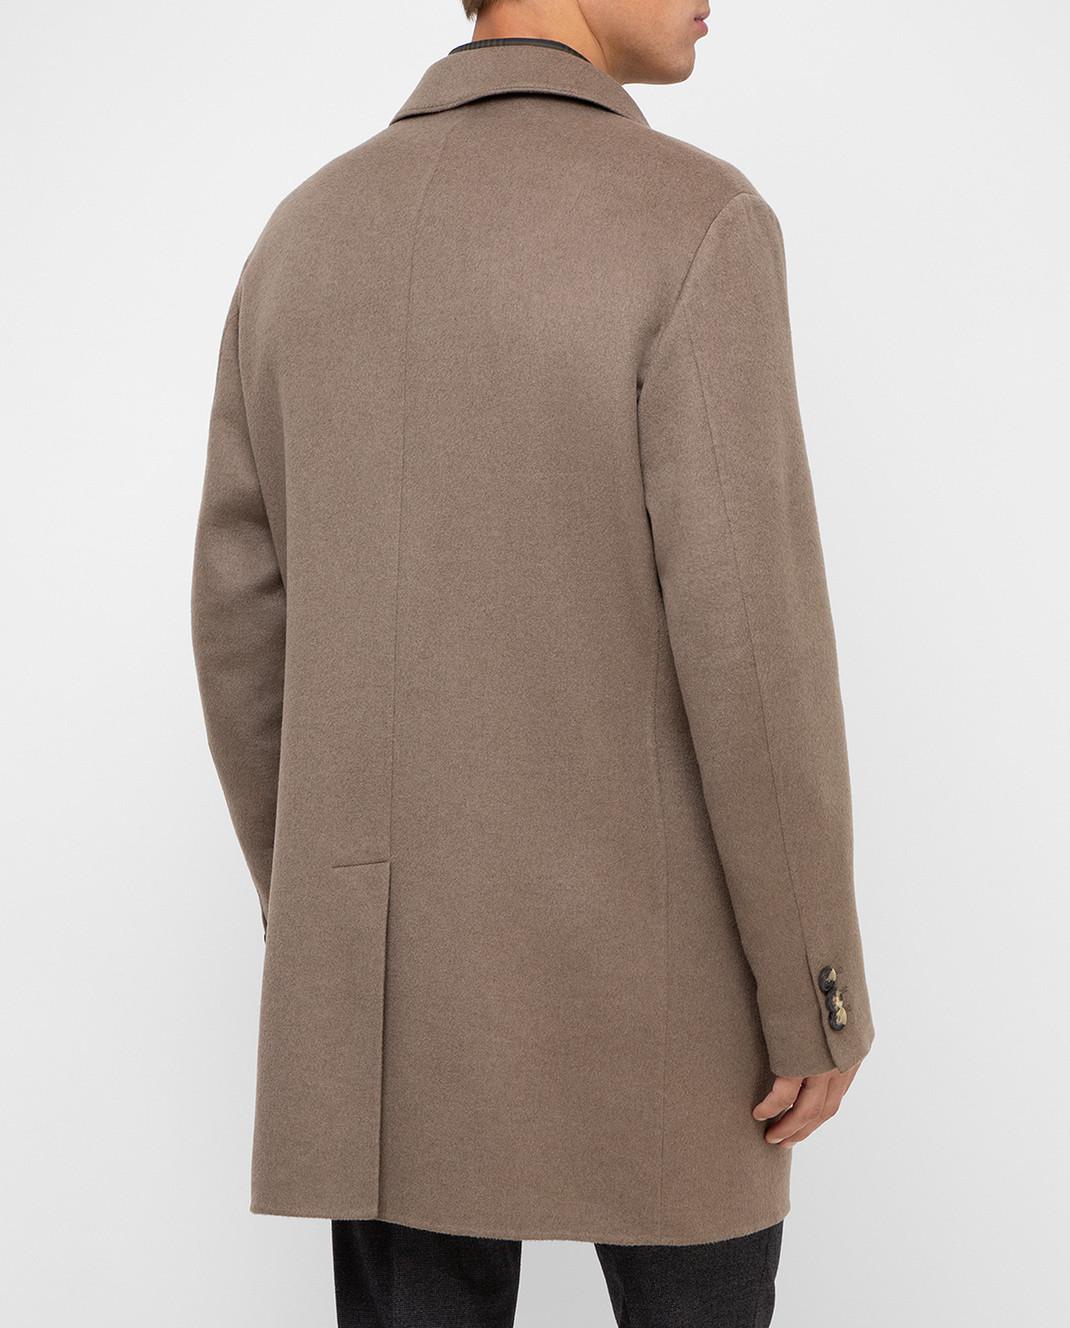 Loro Piana Темно-бежевое пальто из кашемира F1FAI2410 изображение 4